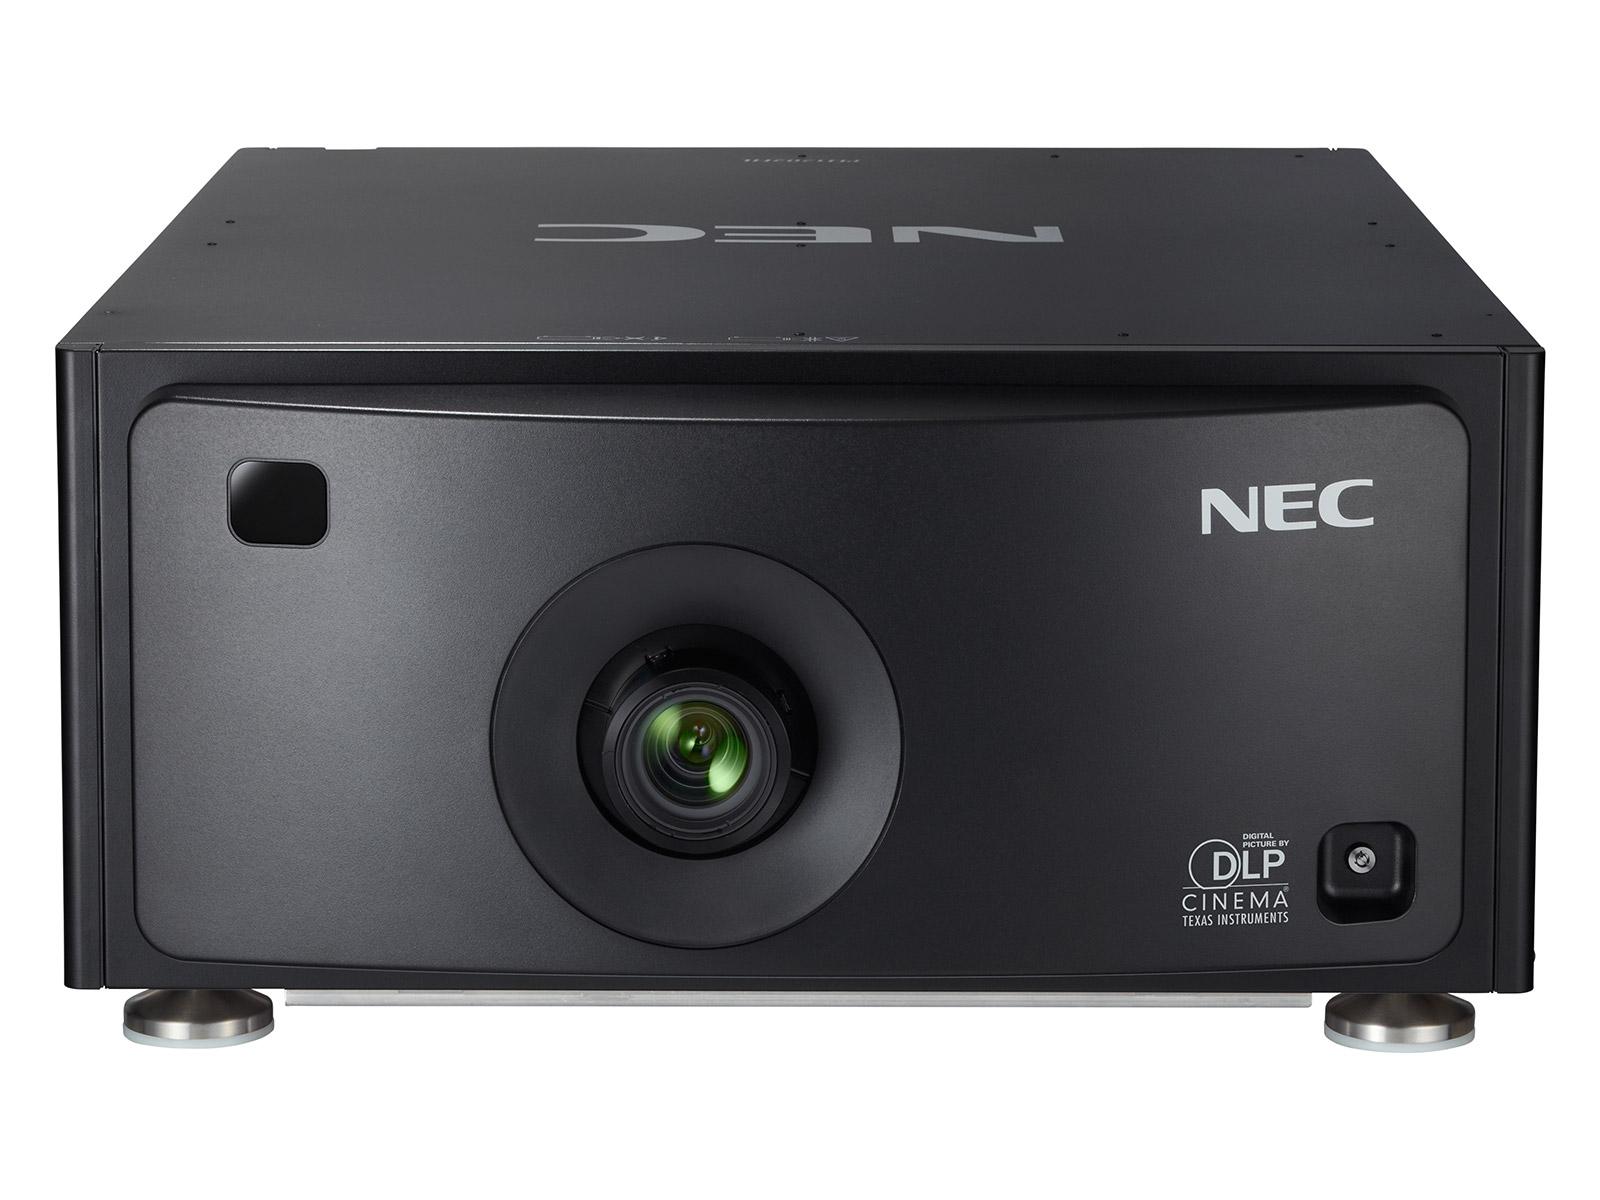 NC1201L-ProjectorViewUpper-front